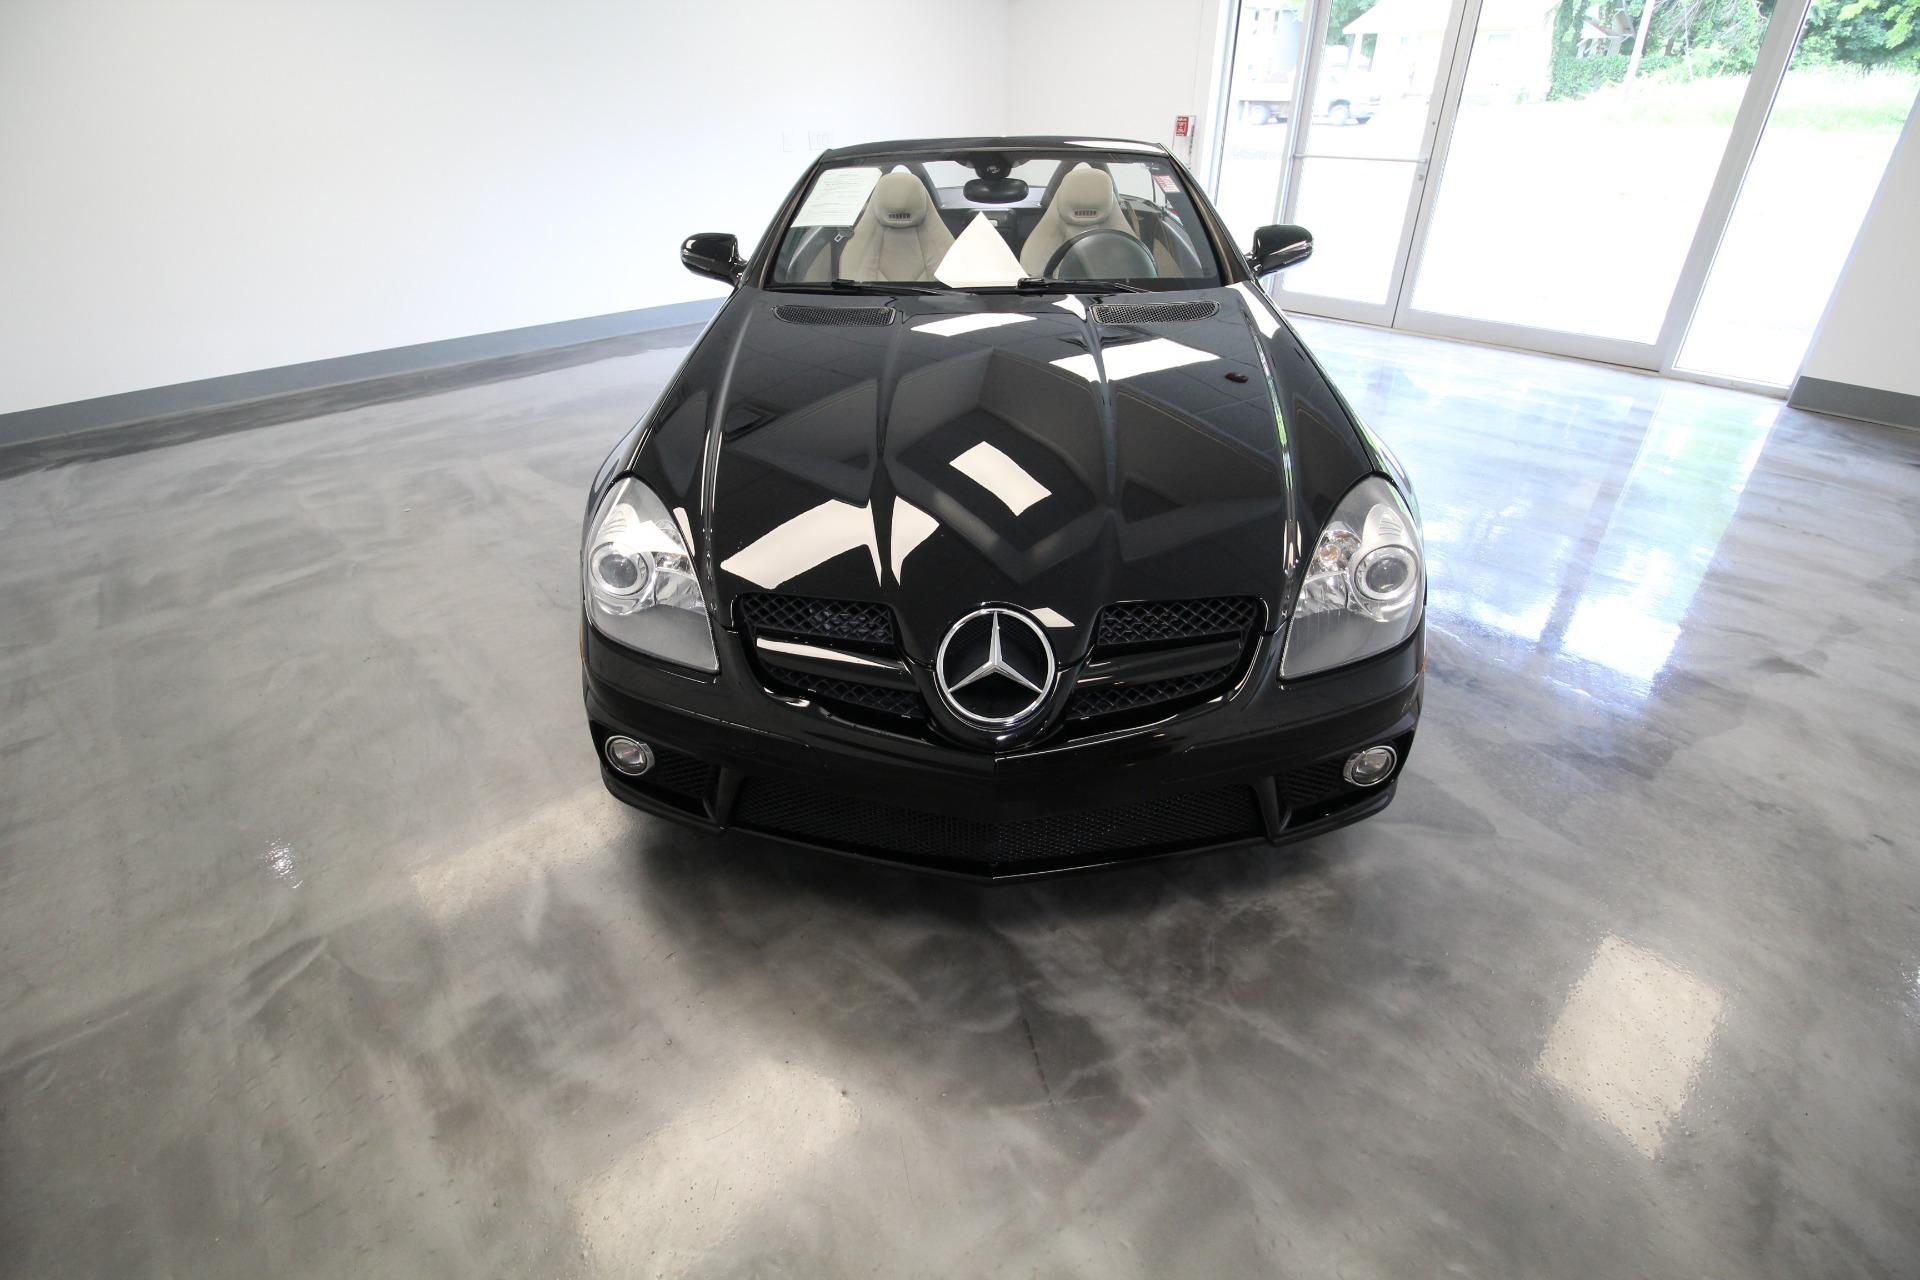 Used 2011 Mercedes-Benz SLK SLK300 SUPER CLEAN SUPERB CONDITION LOW MILES | Albany, NY